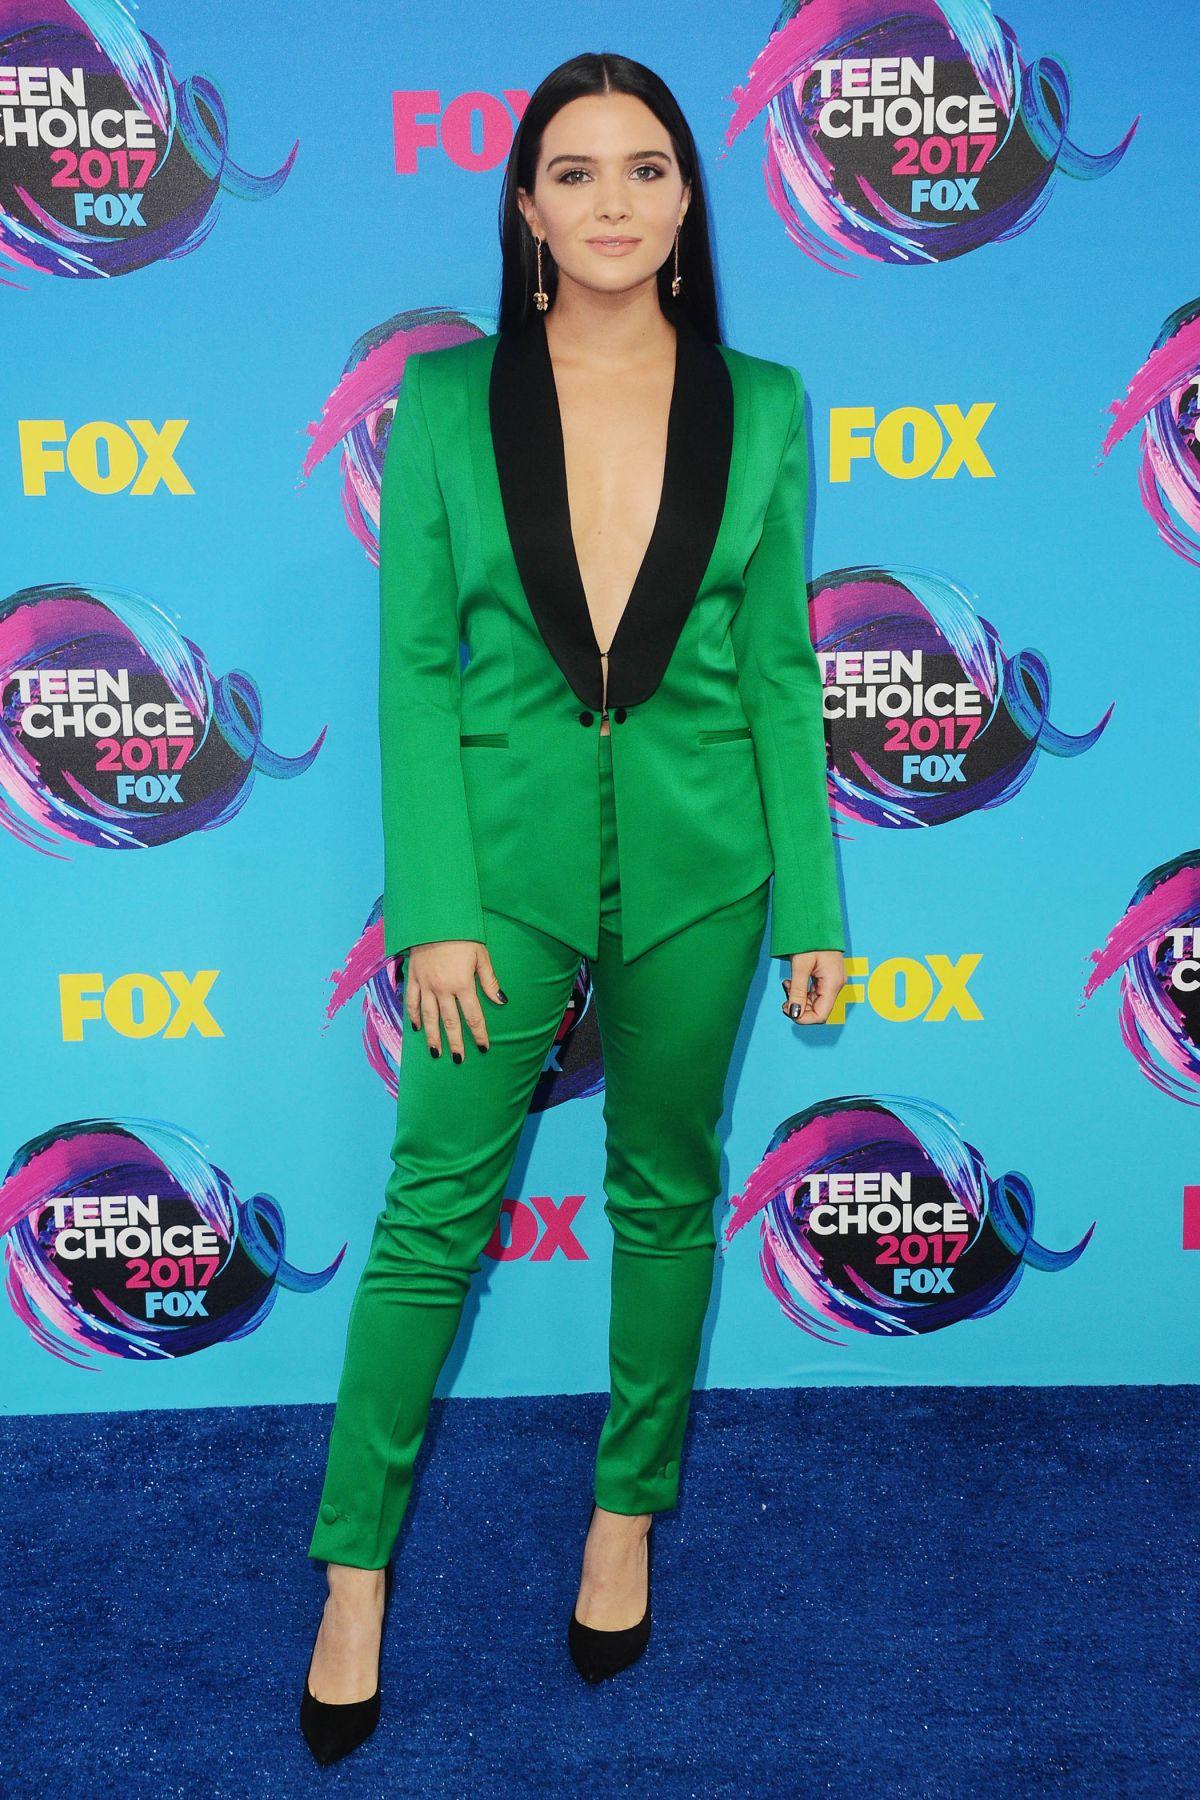 KATIE STEVENS at Teen Choice Awards 2017 in Los Angeles 08/13/2017